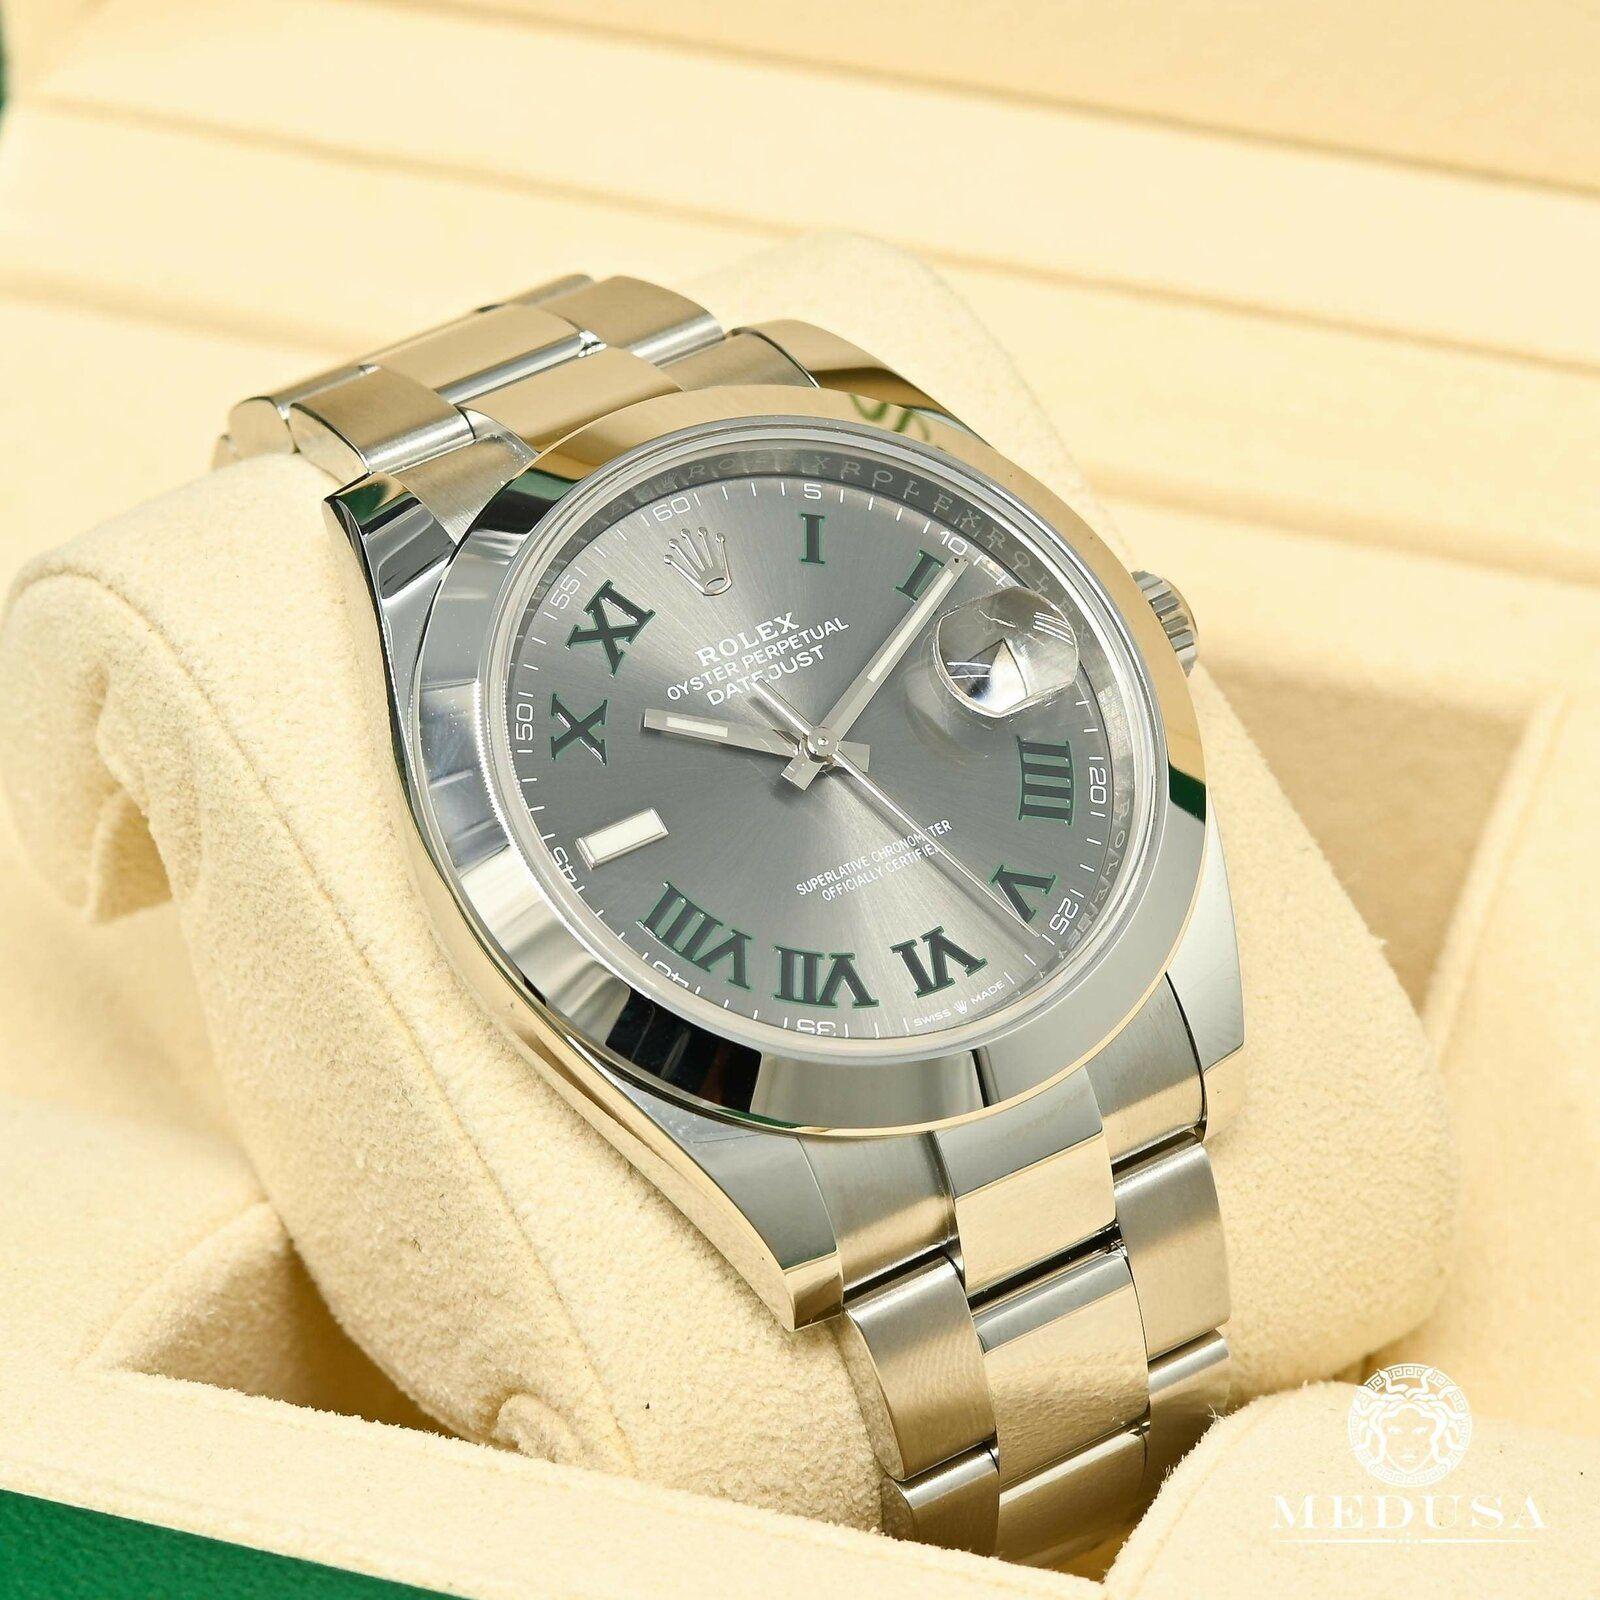 rolex-datejust-41mm-oyster-wimbledon-montre-stainless-bijoux-medusa-homme-quebec-canada-493.jpg